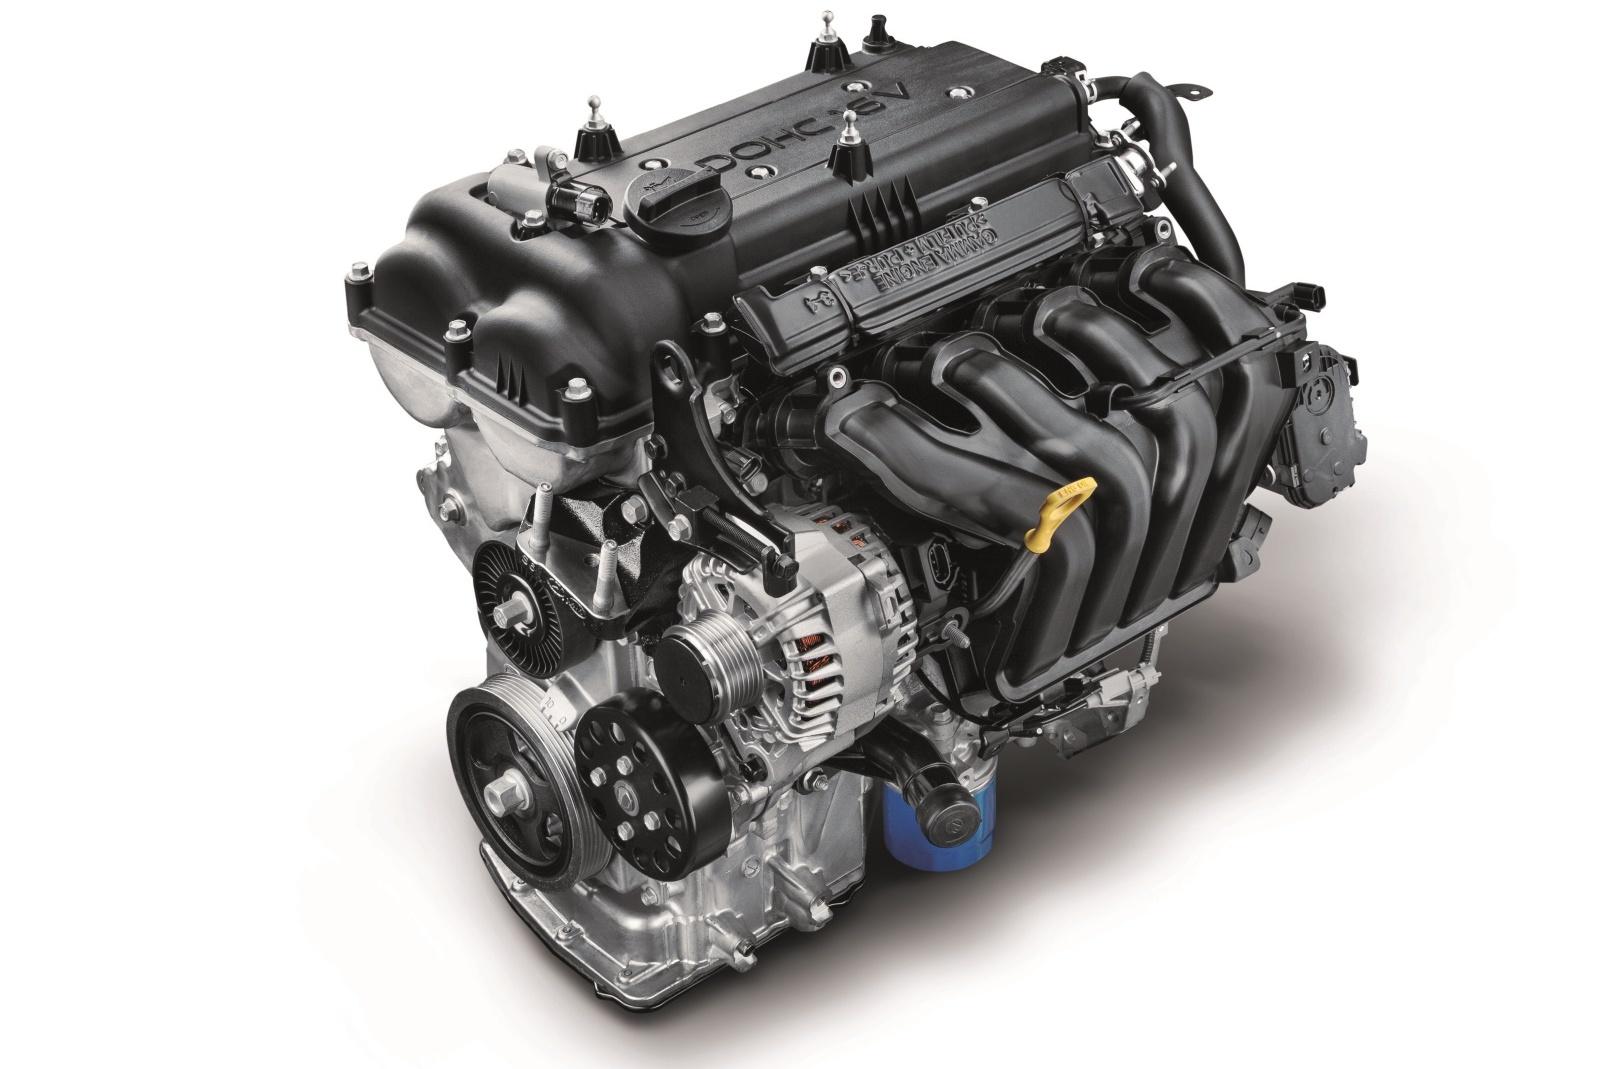 Motor Hyundai 1.6 dual vvt